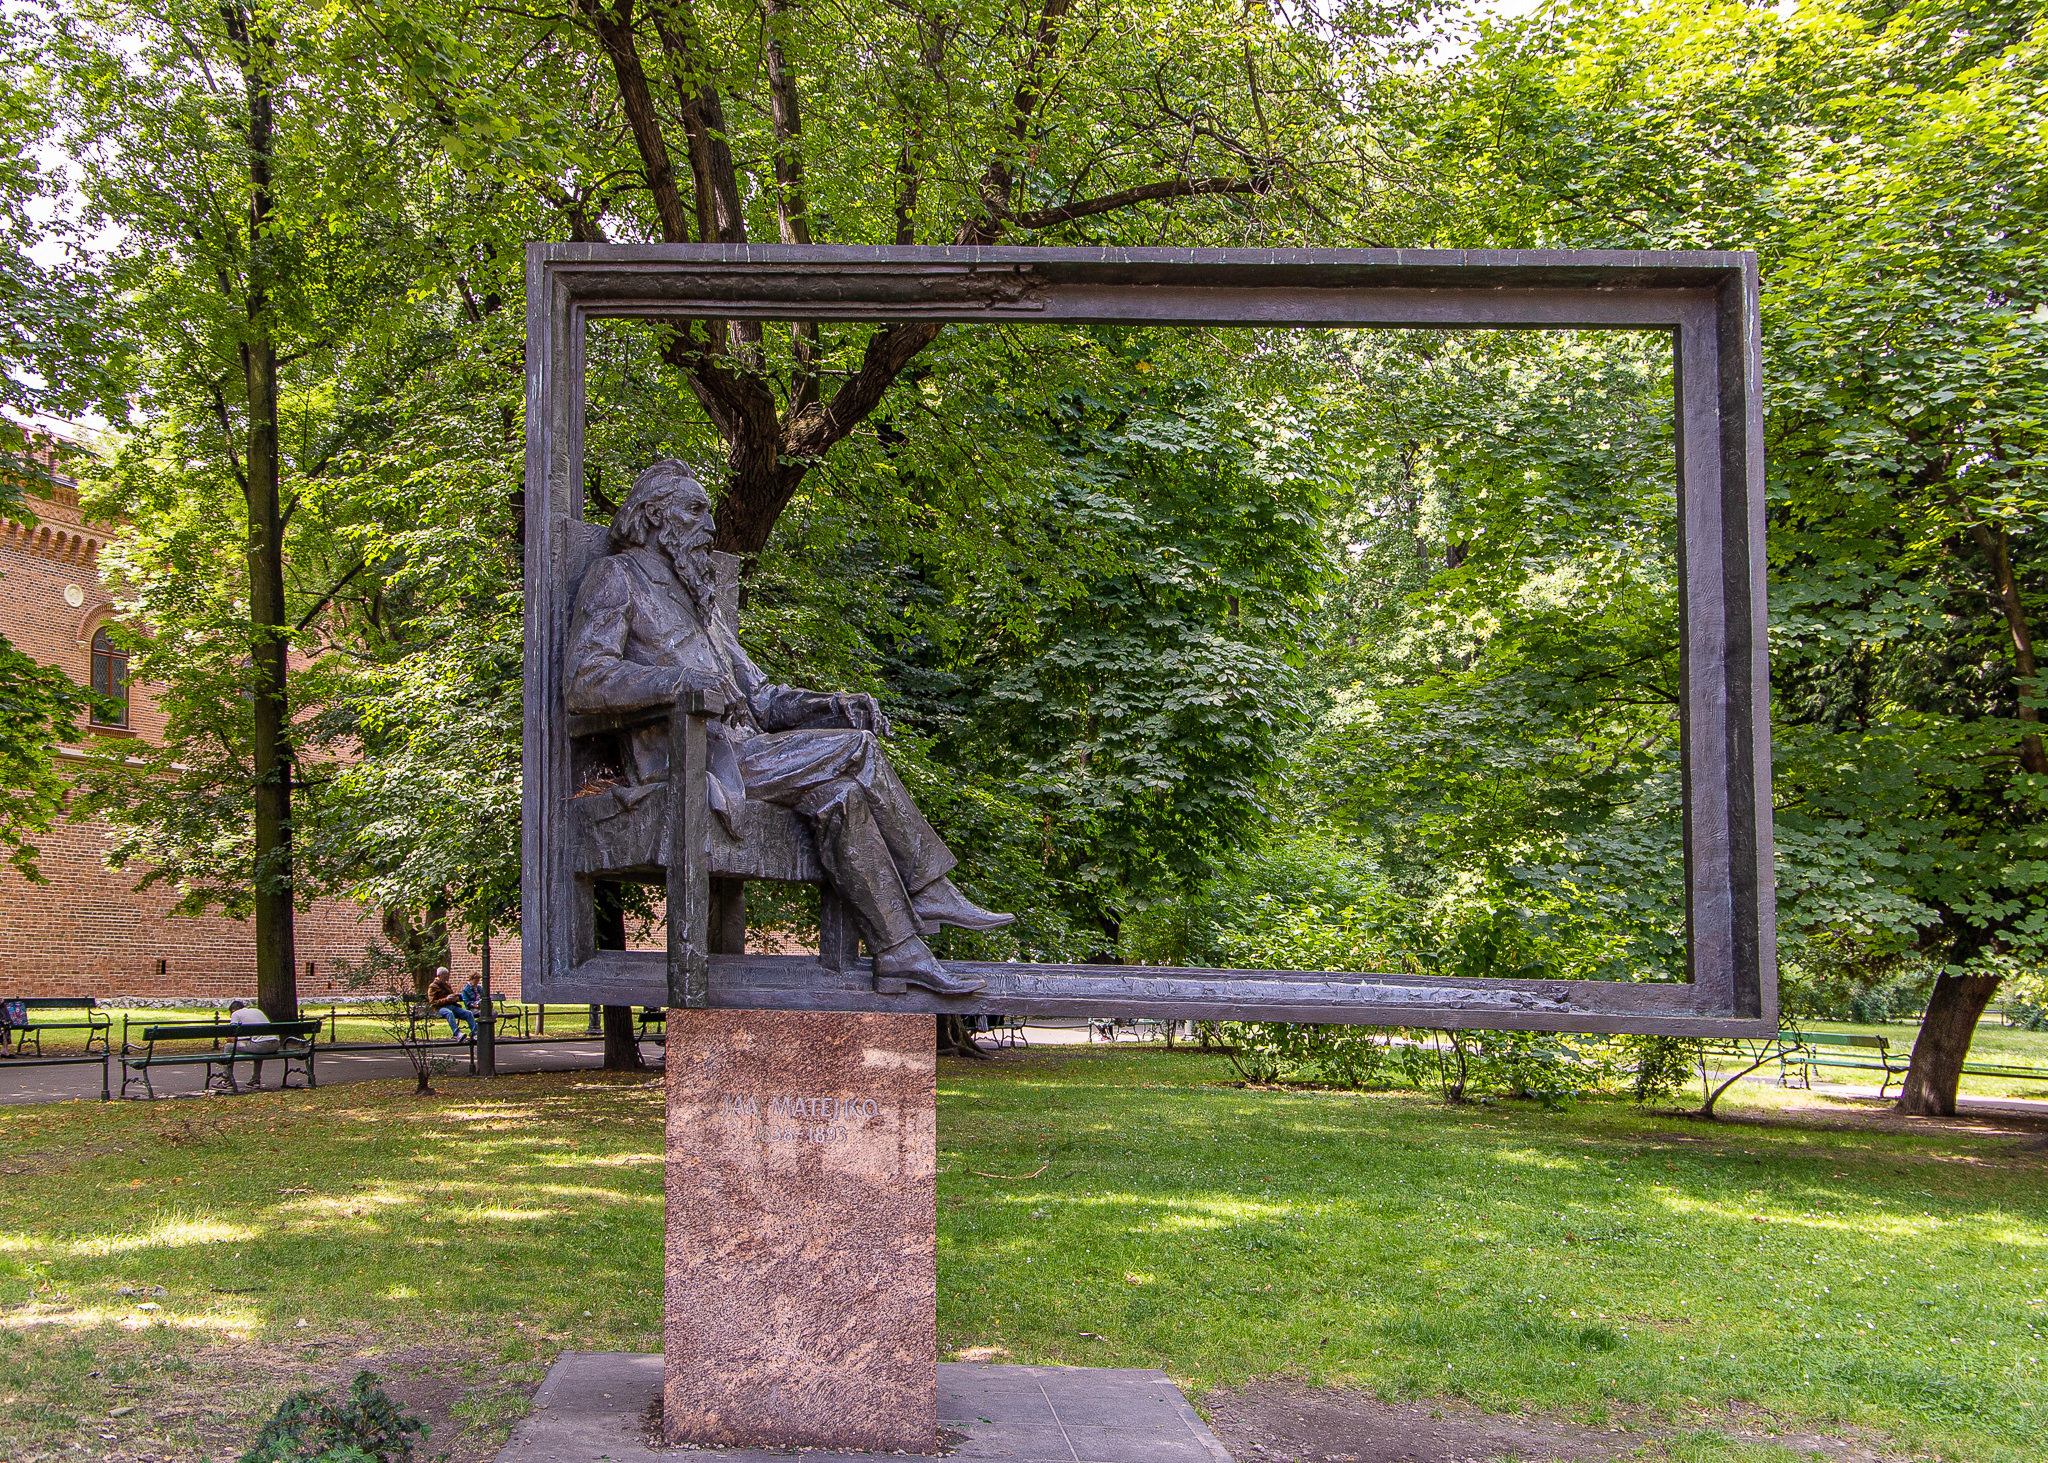 Statue of the famous Polish painter Jan Matejko